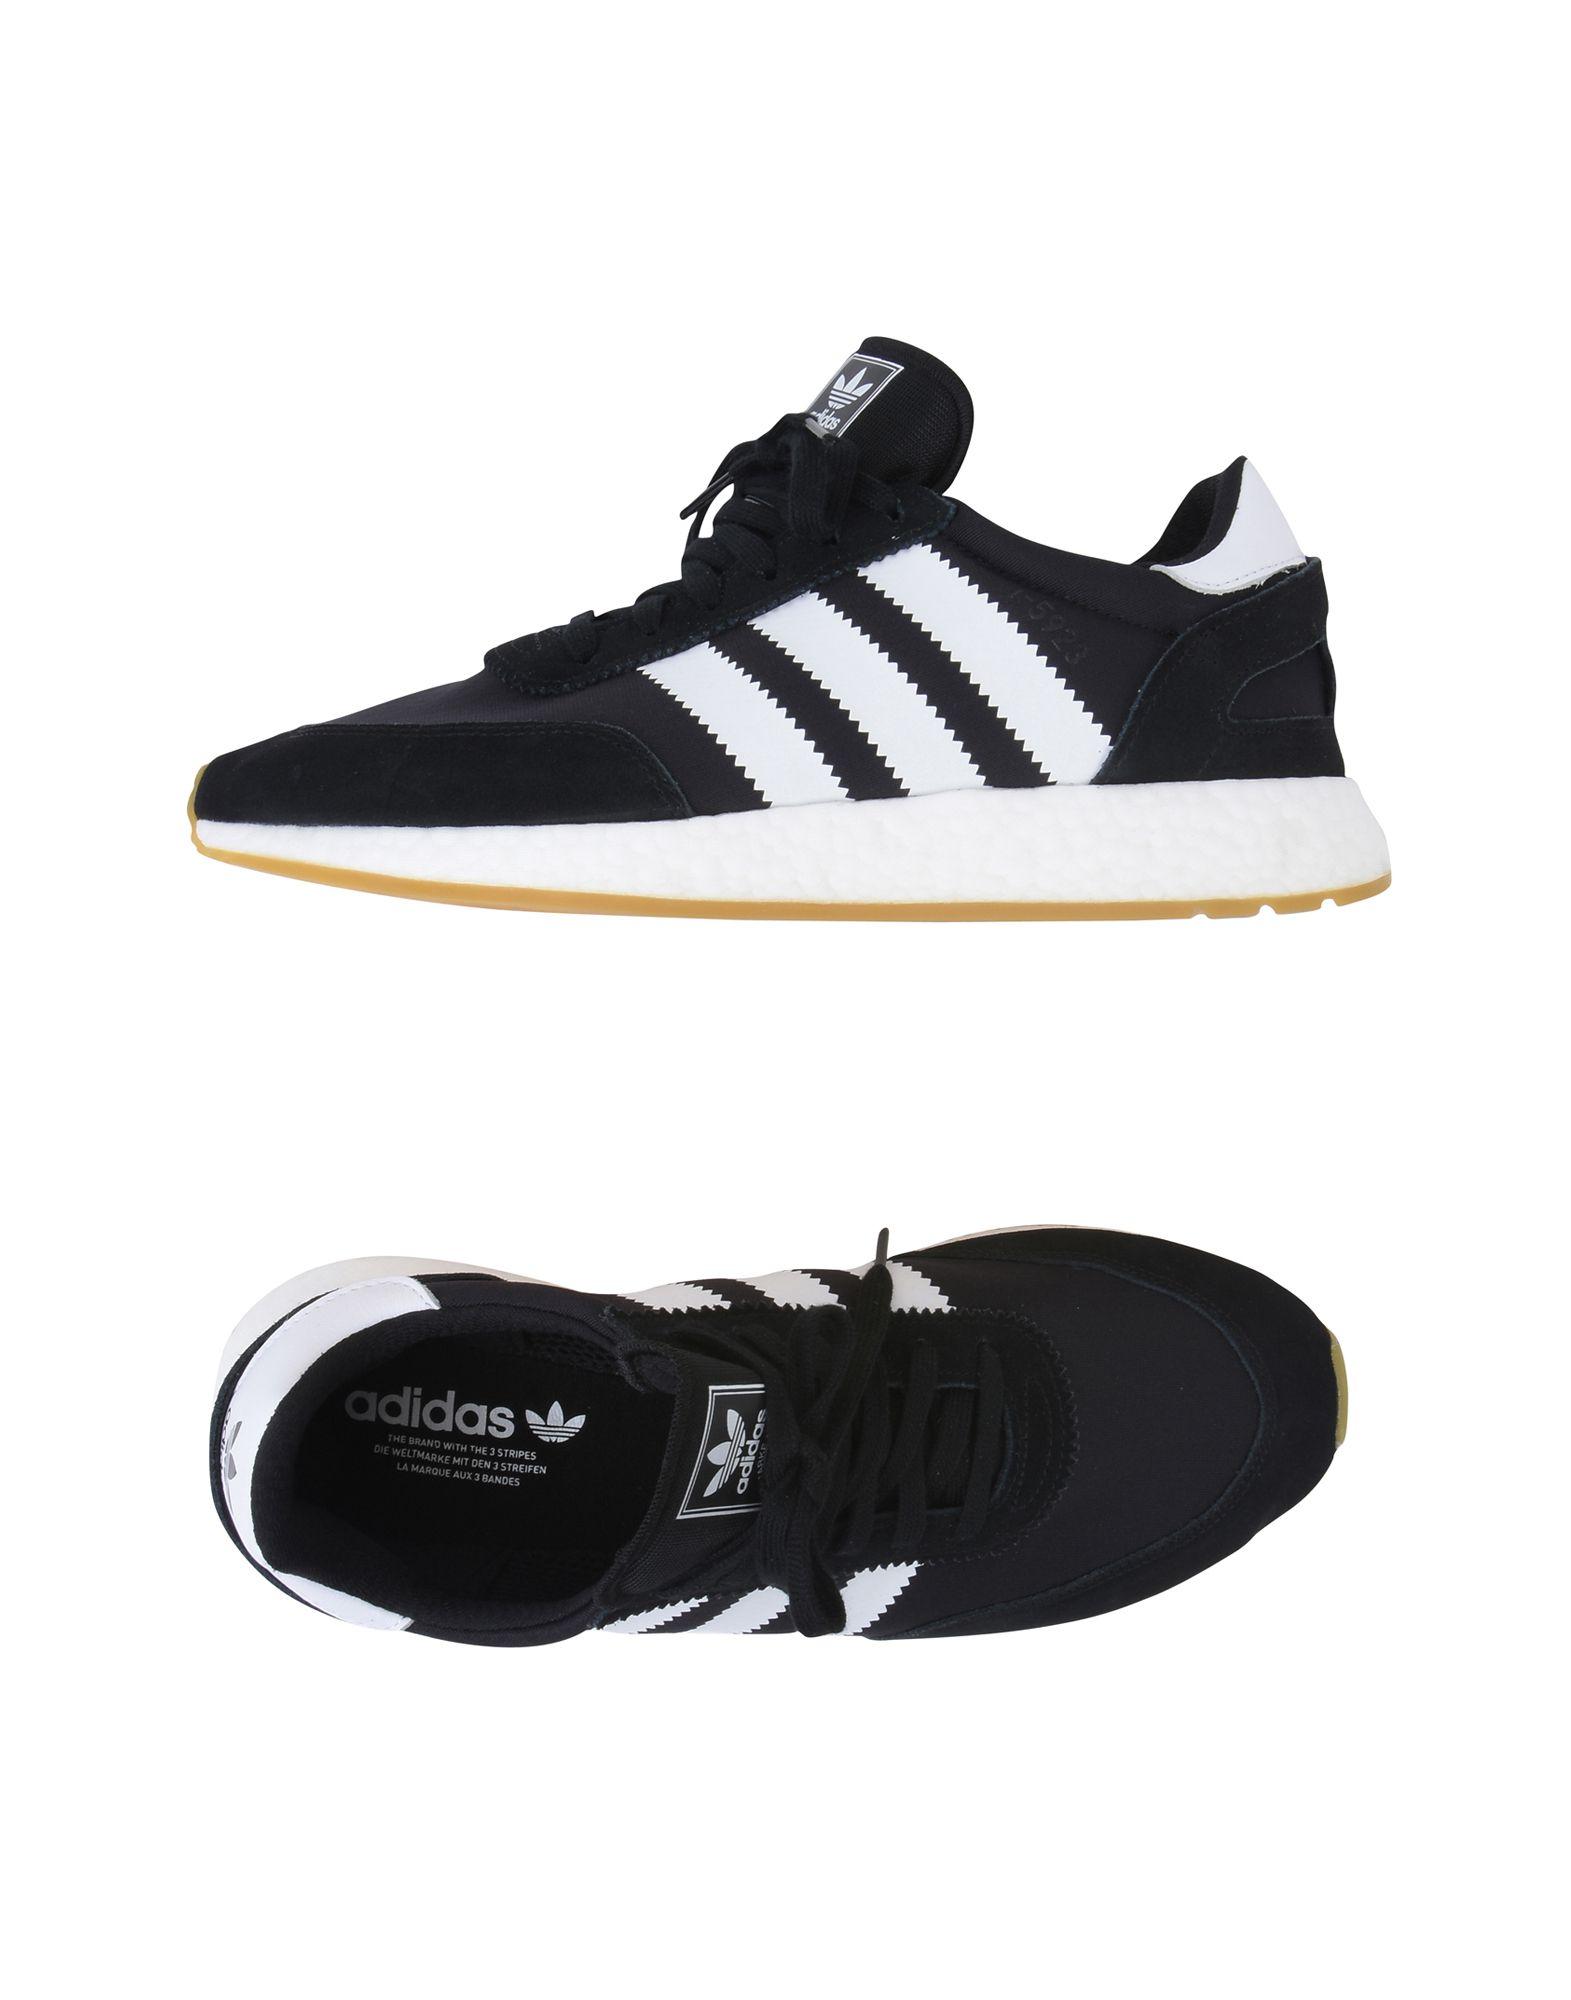 Adidas Adidas Adidas Originals IGutes Preis-Leistungs-Verhältnis, es lohnt sich c5b2f4